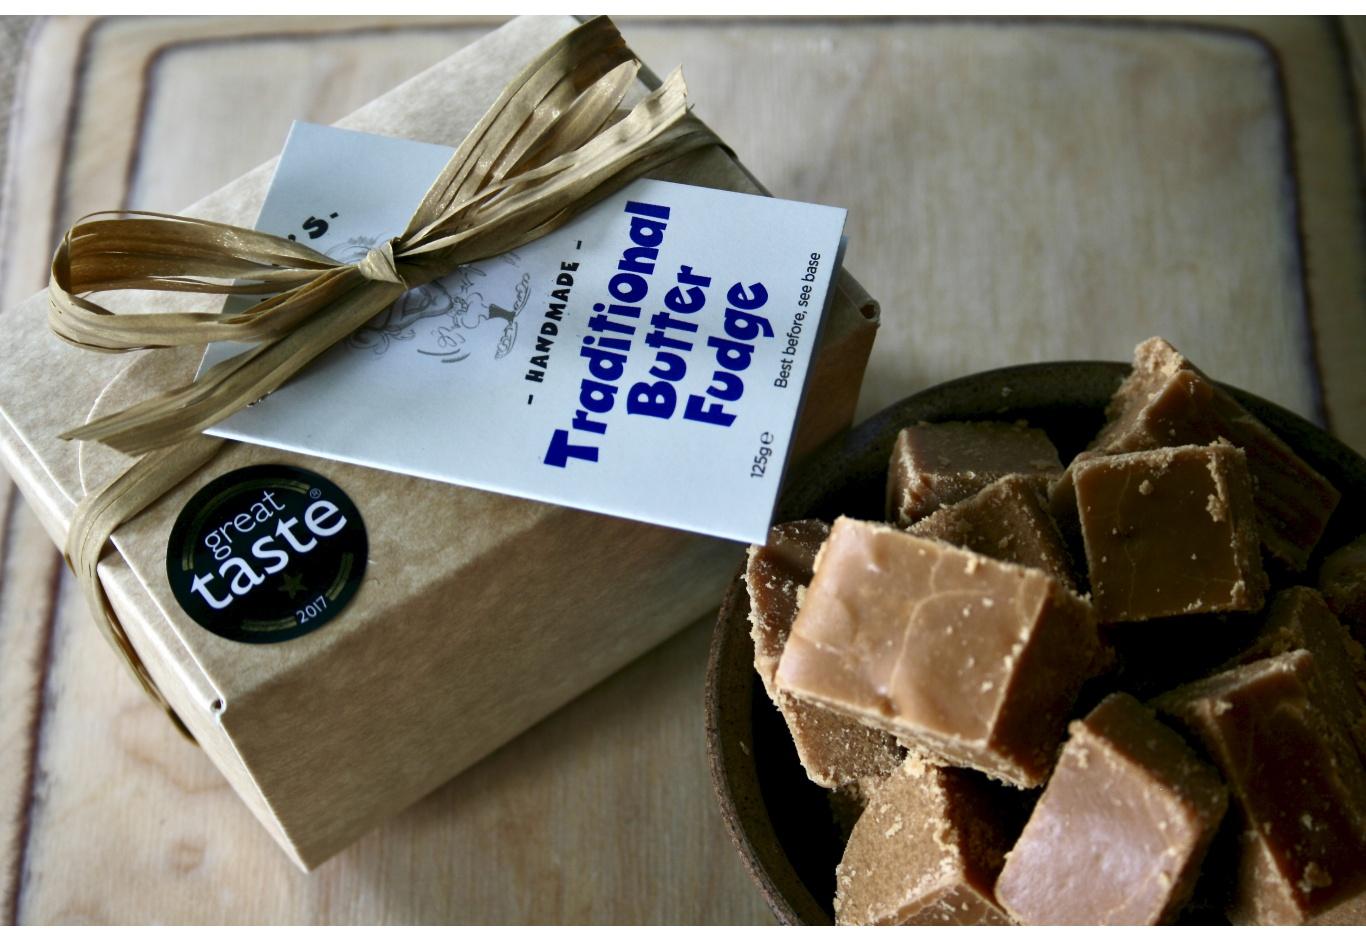 The Fudge Lover's Gift Box (125g)